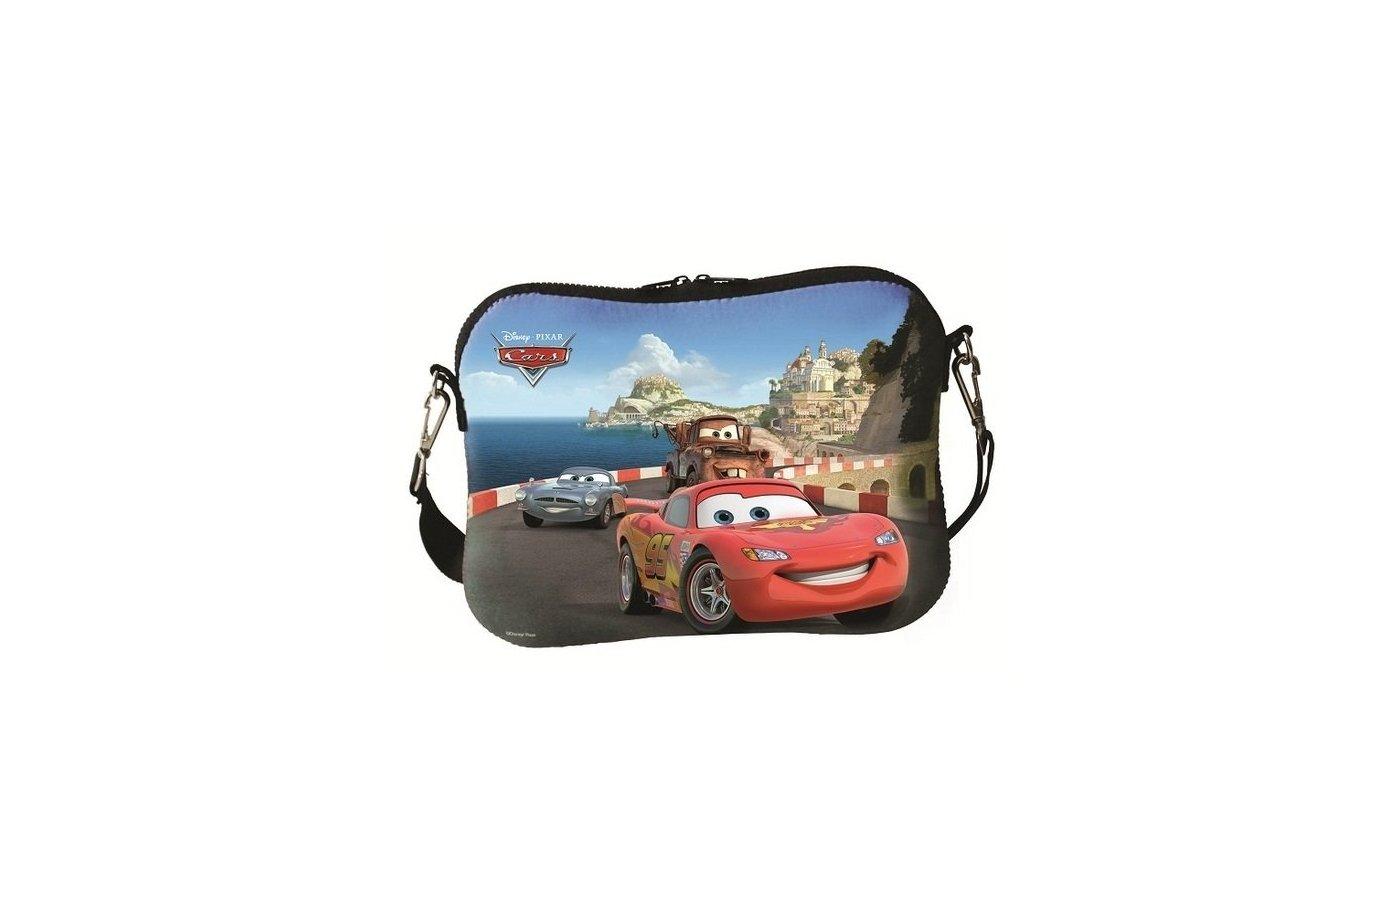 Кейс для ноутбука DISNEY DSY LB3002K LAPTOP BAG CARS 10